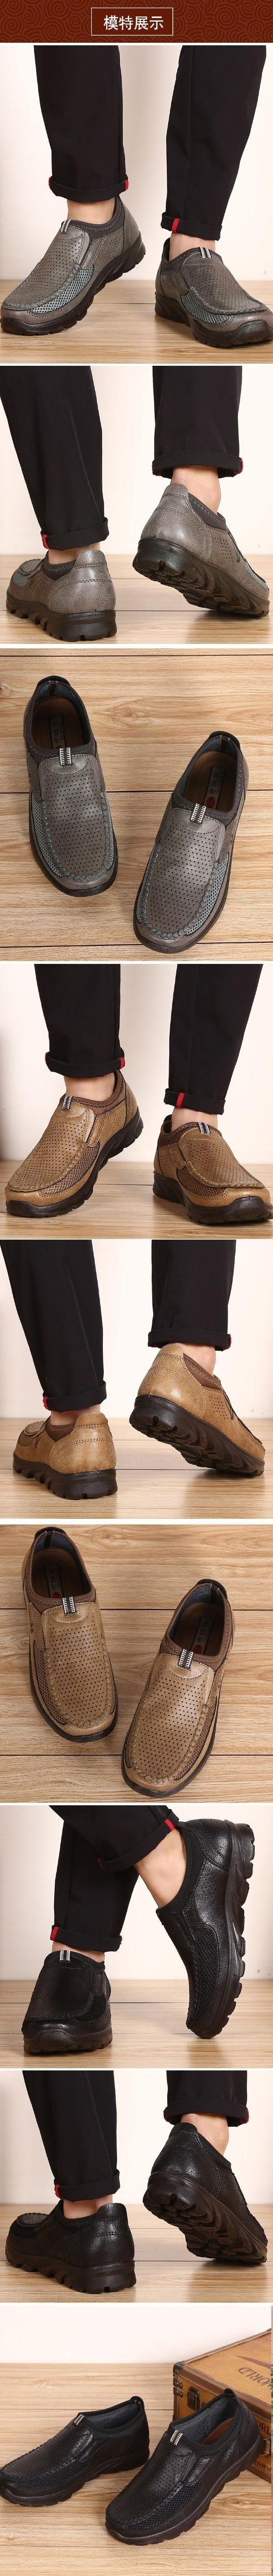 HTB14wVlP3HqK1RjSZFgq6y7JXXaR Luxury Brand Men Casual Shoes Lightweight Breathable Sneakers Male Walking Shoes Fashion Mesh Zapatillas Footwear Big Szie 38-48